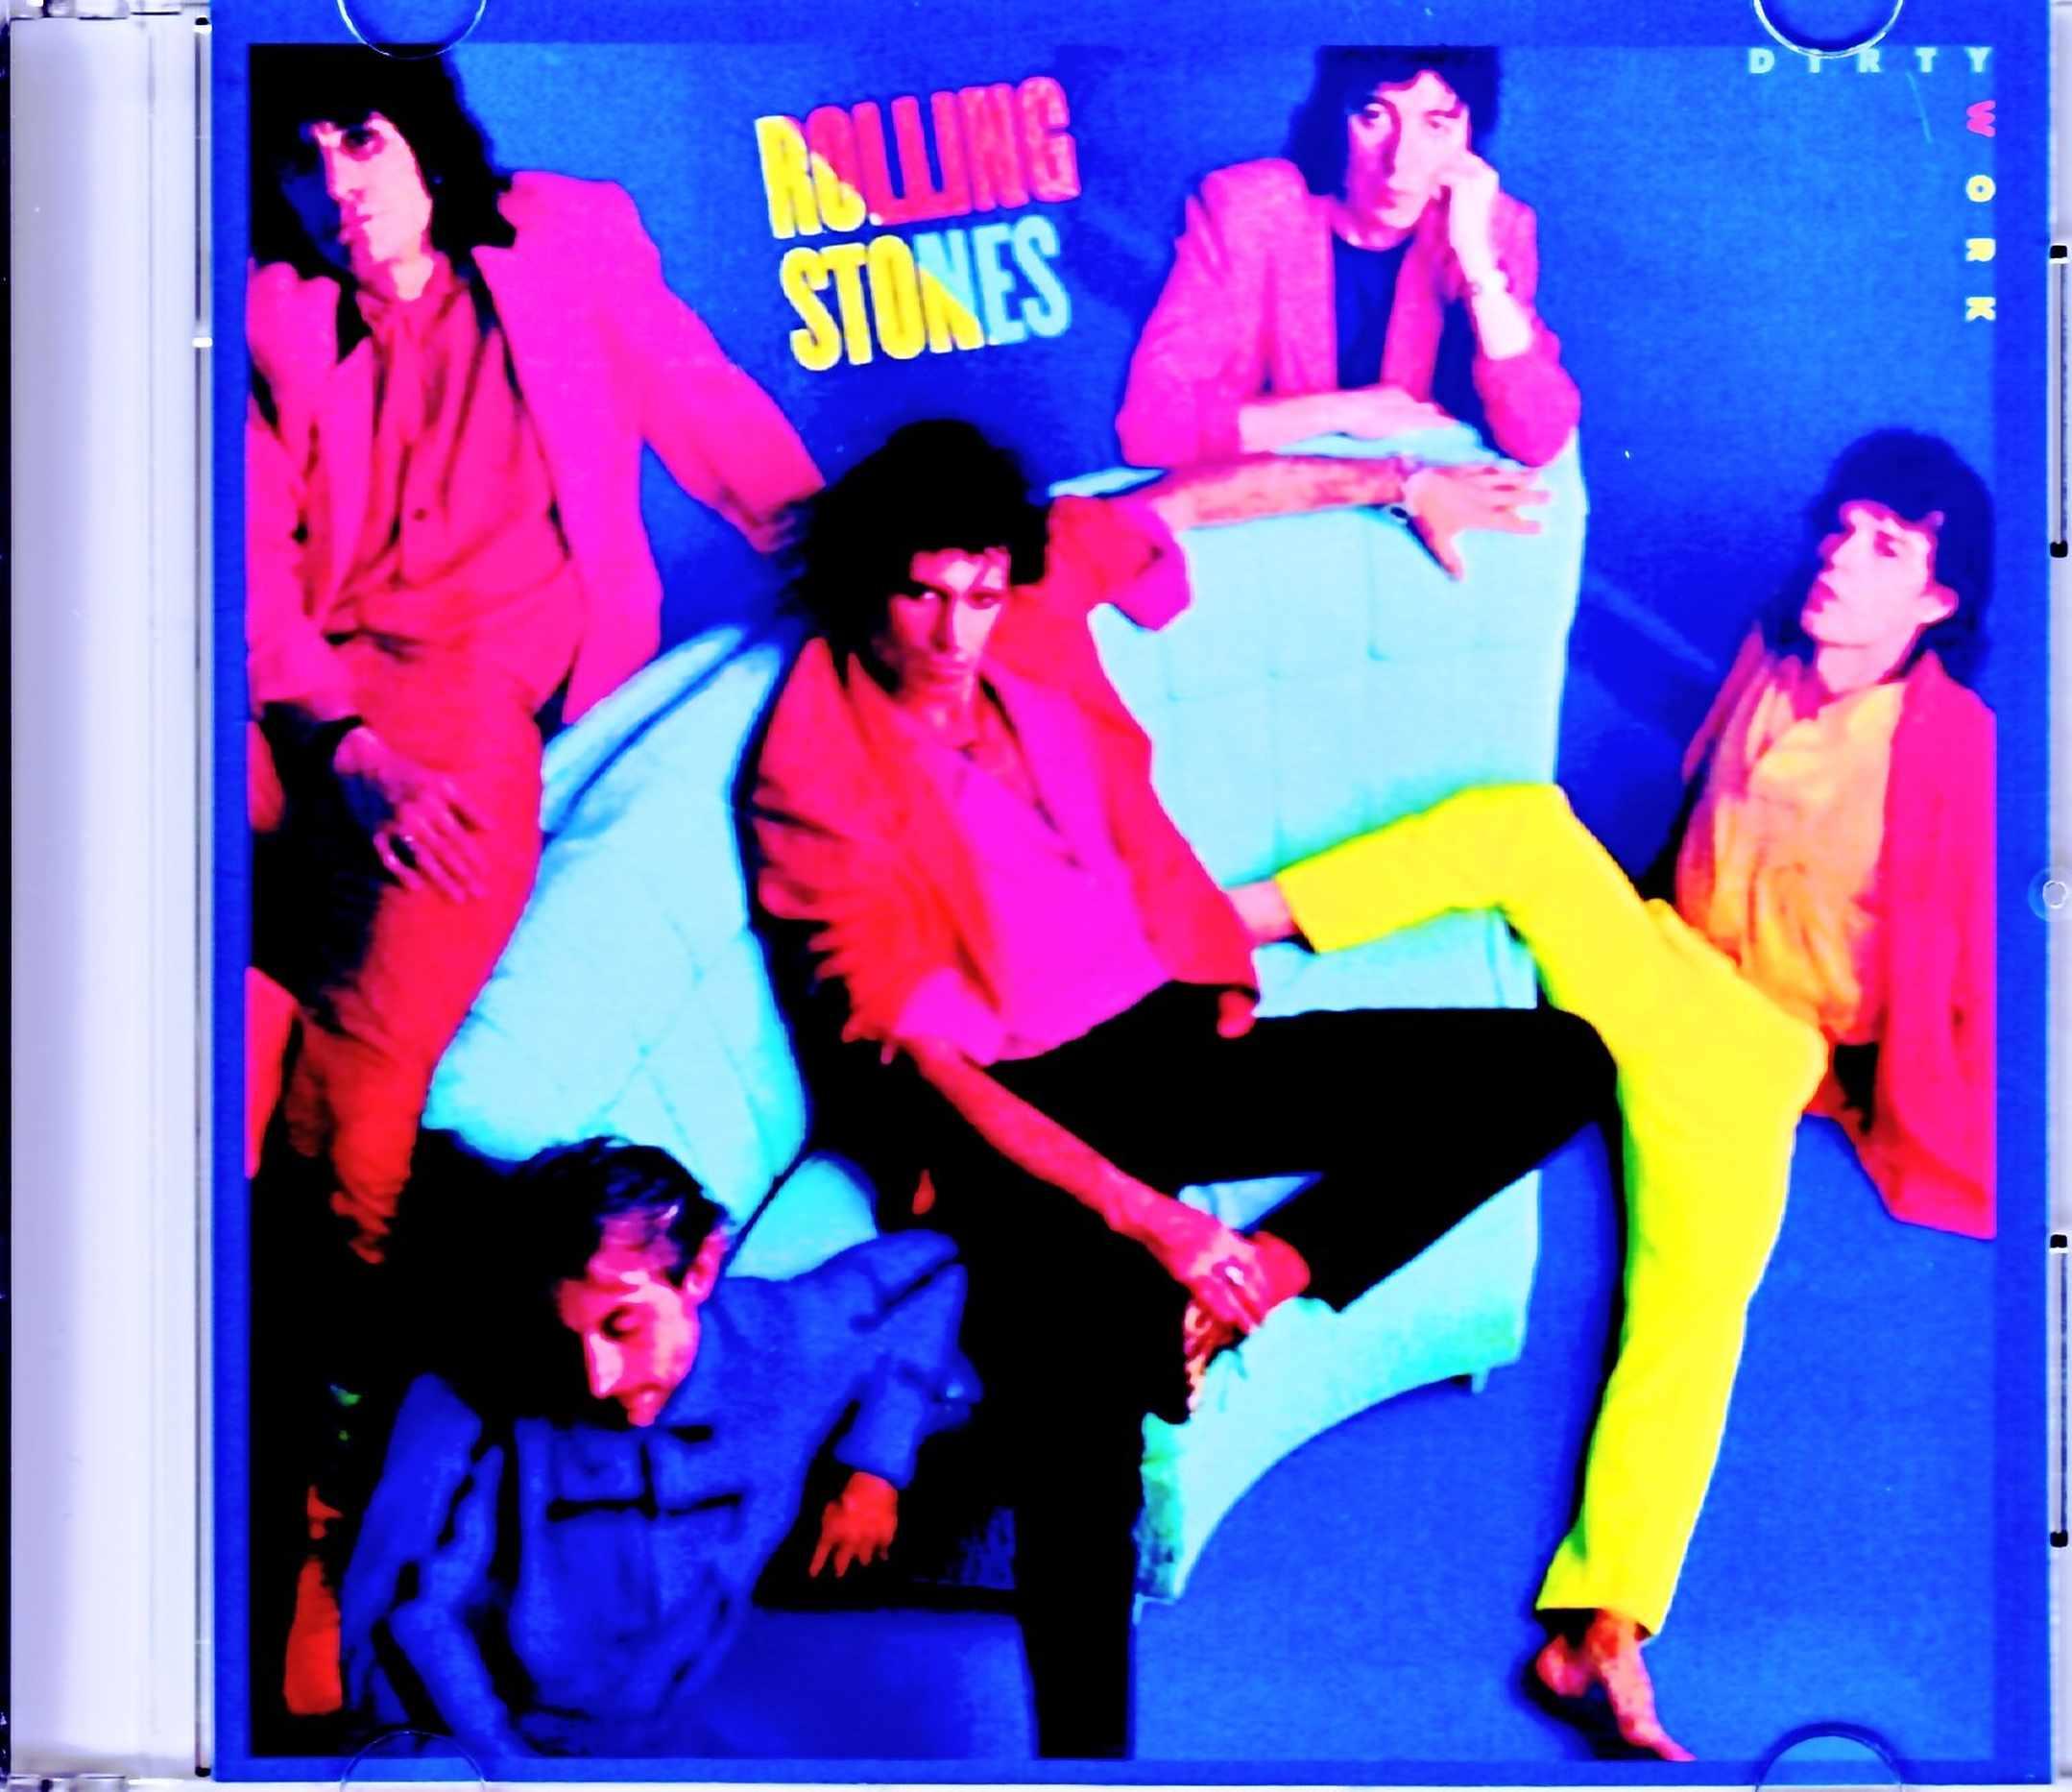 Rolling Stones ローリング・ストーンズ/ダーティ・ワーク Dirty Work UK Original LP